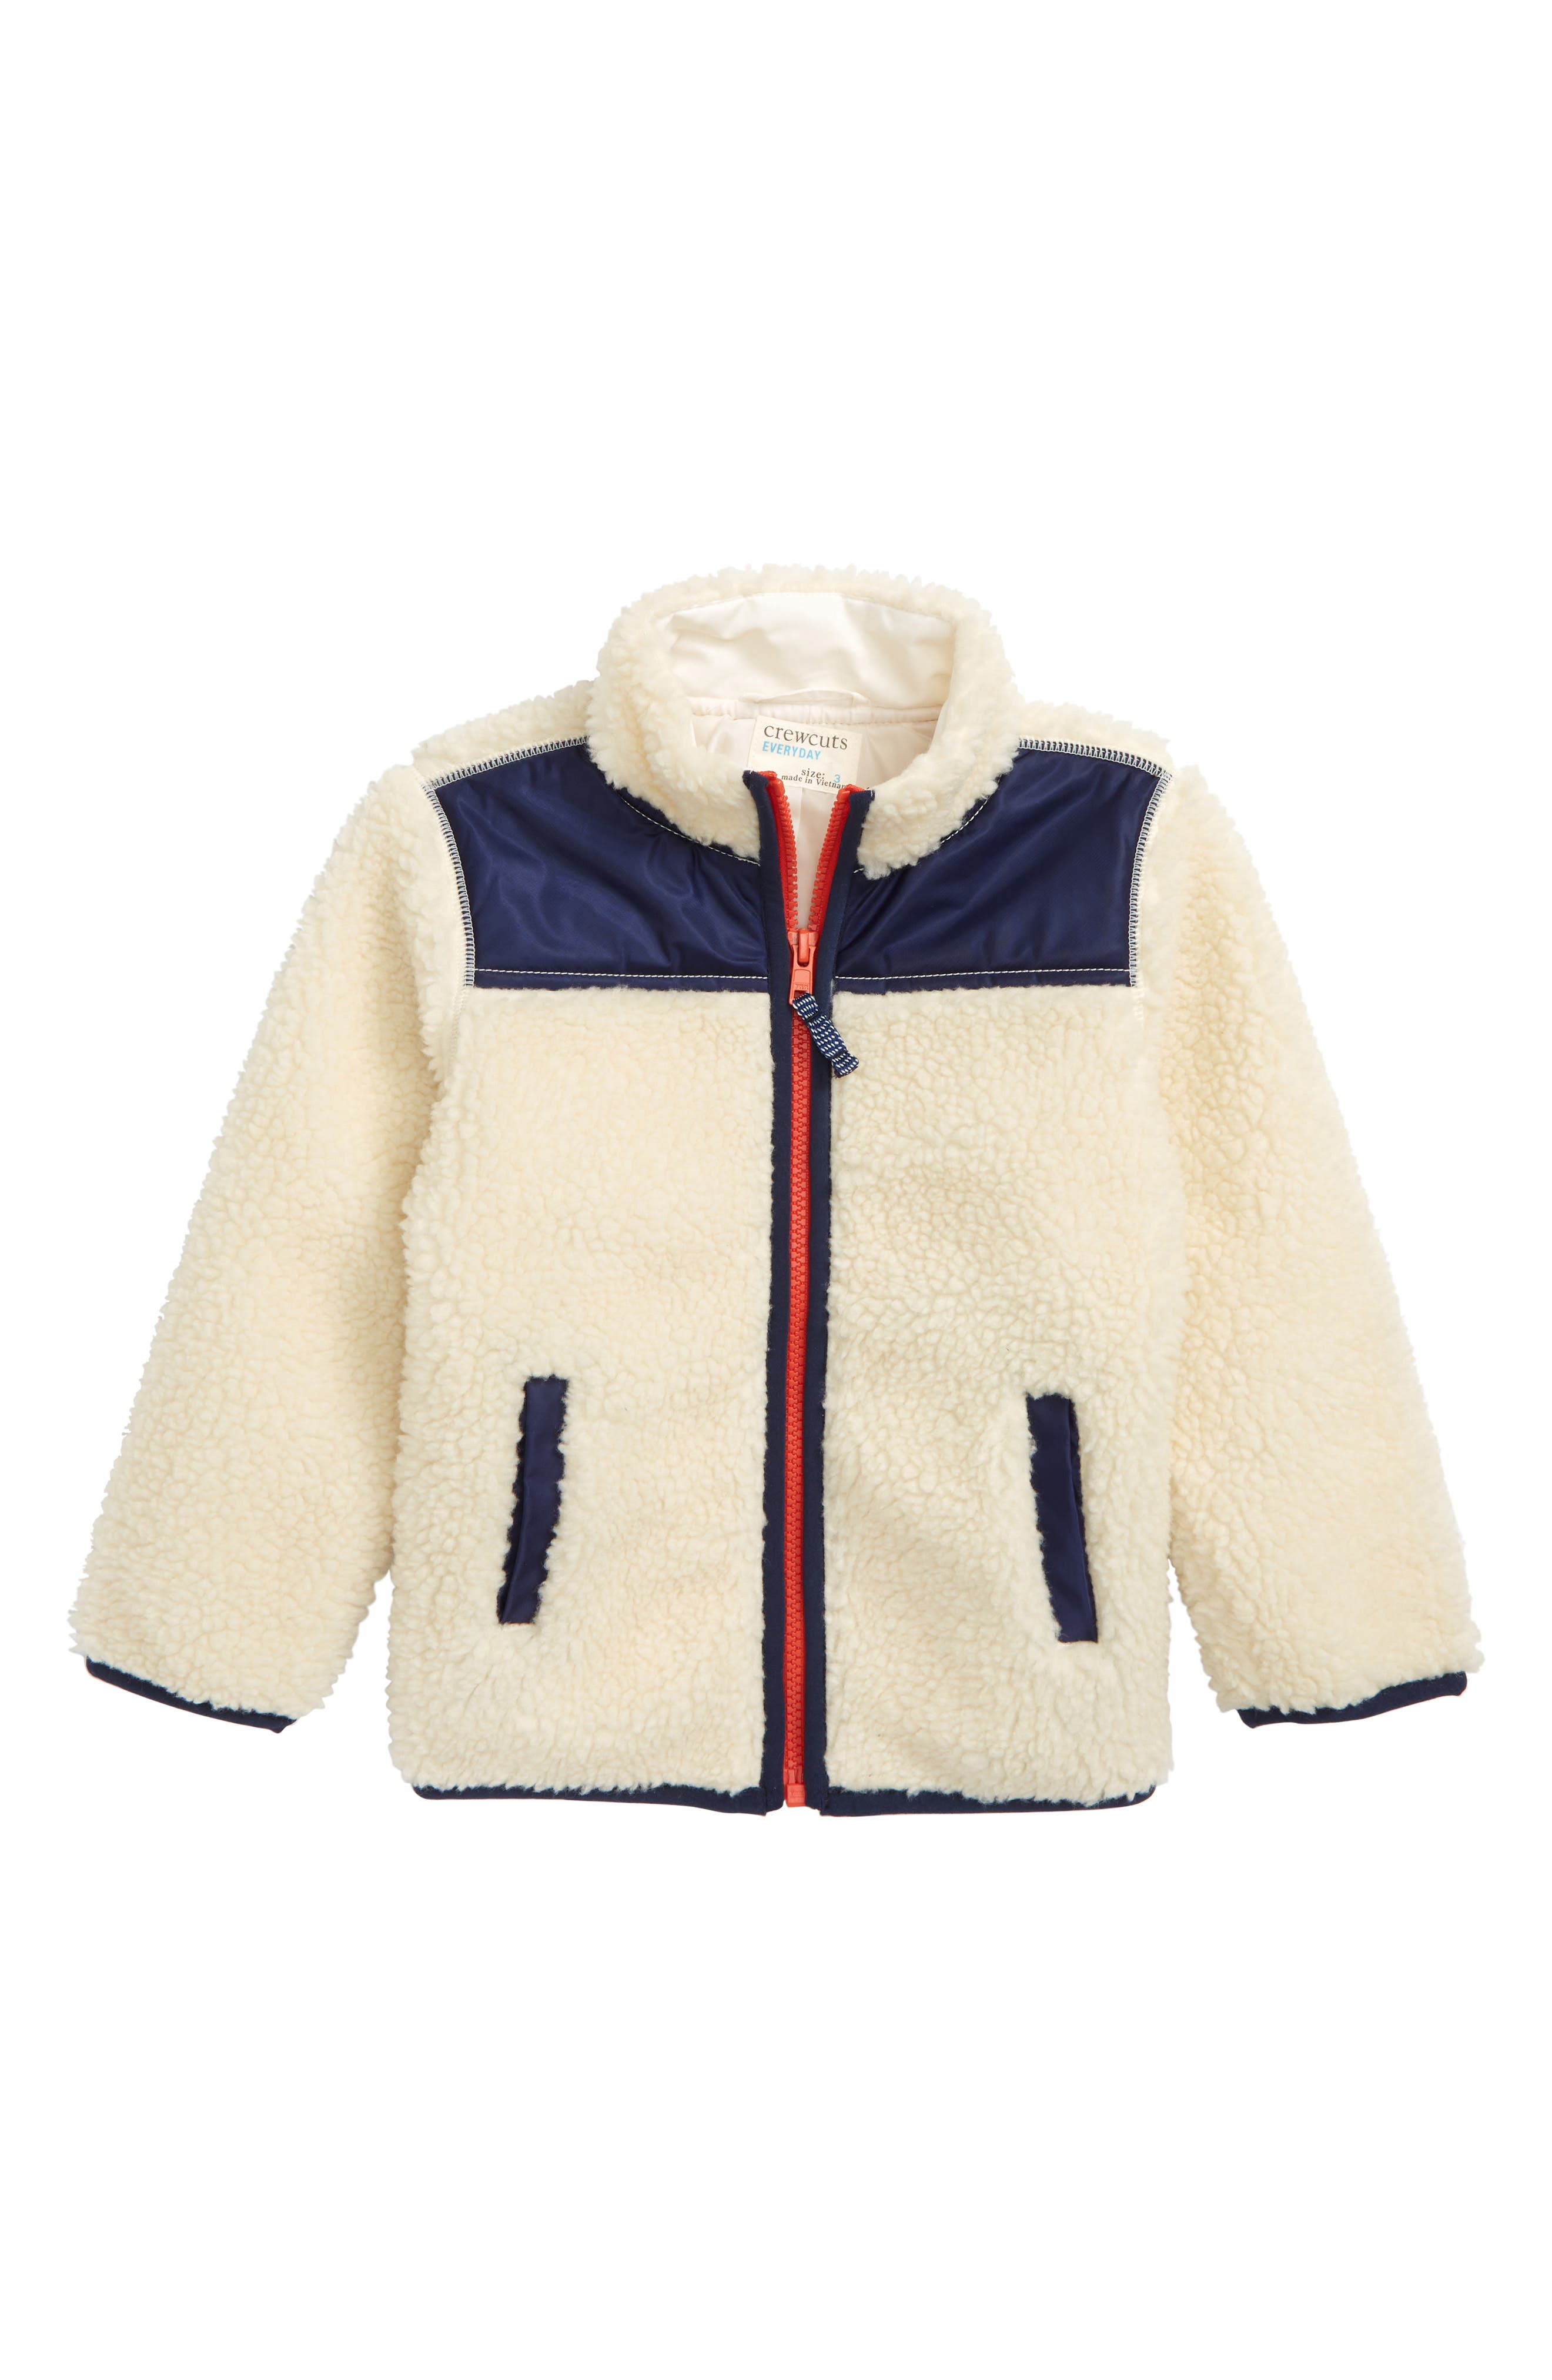 Colorblock Fleece Jacket,                             Main thumbnail 1, color,                             LINEN